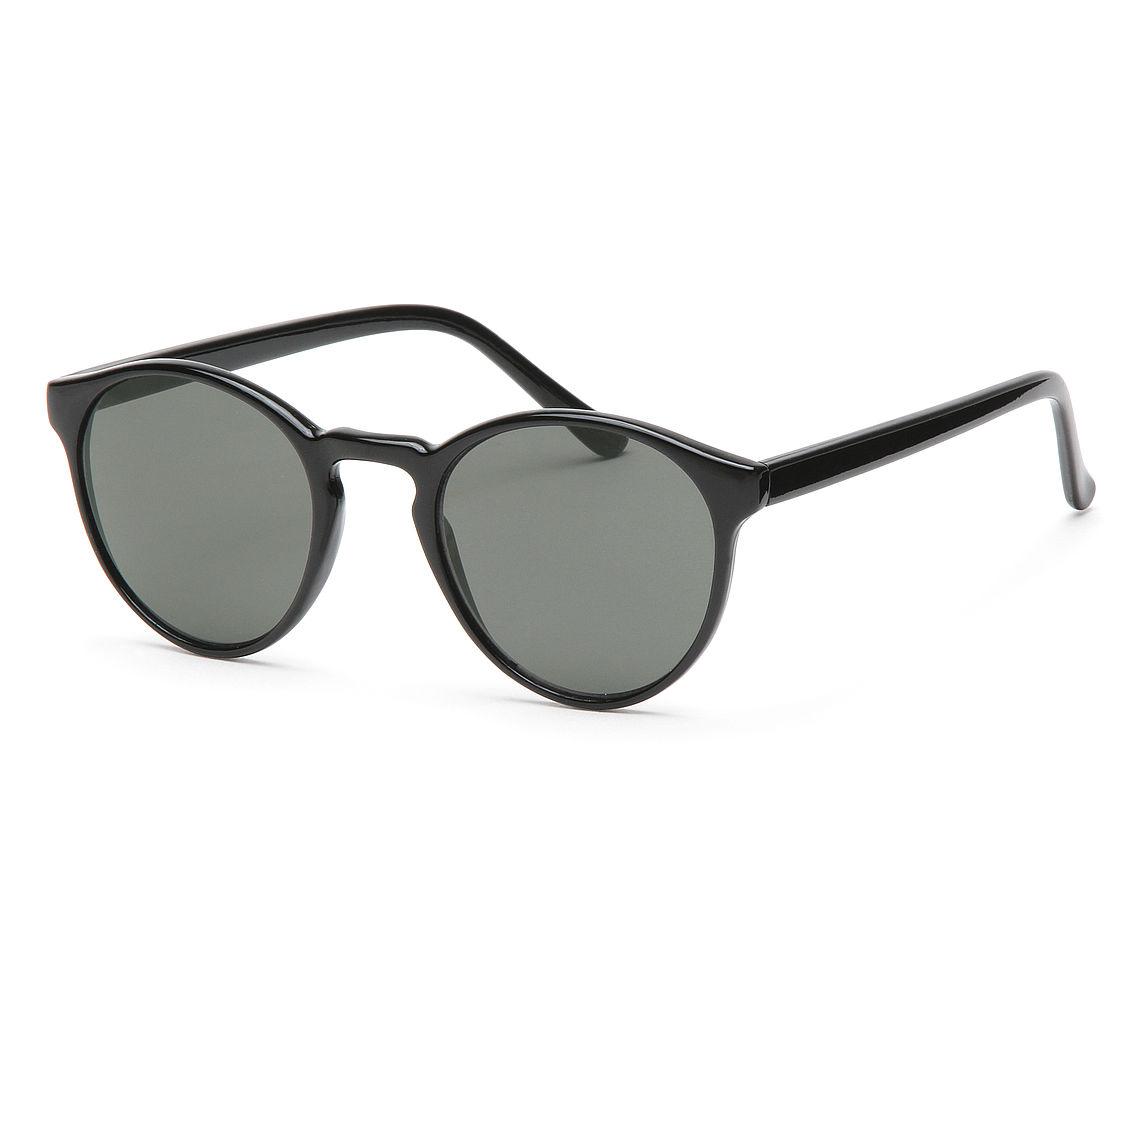 Sunglasses 302240